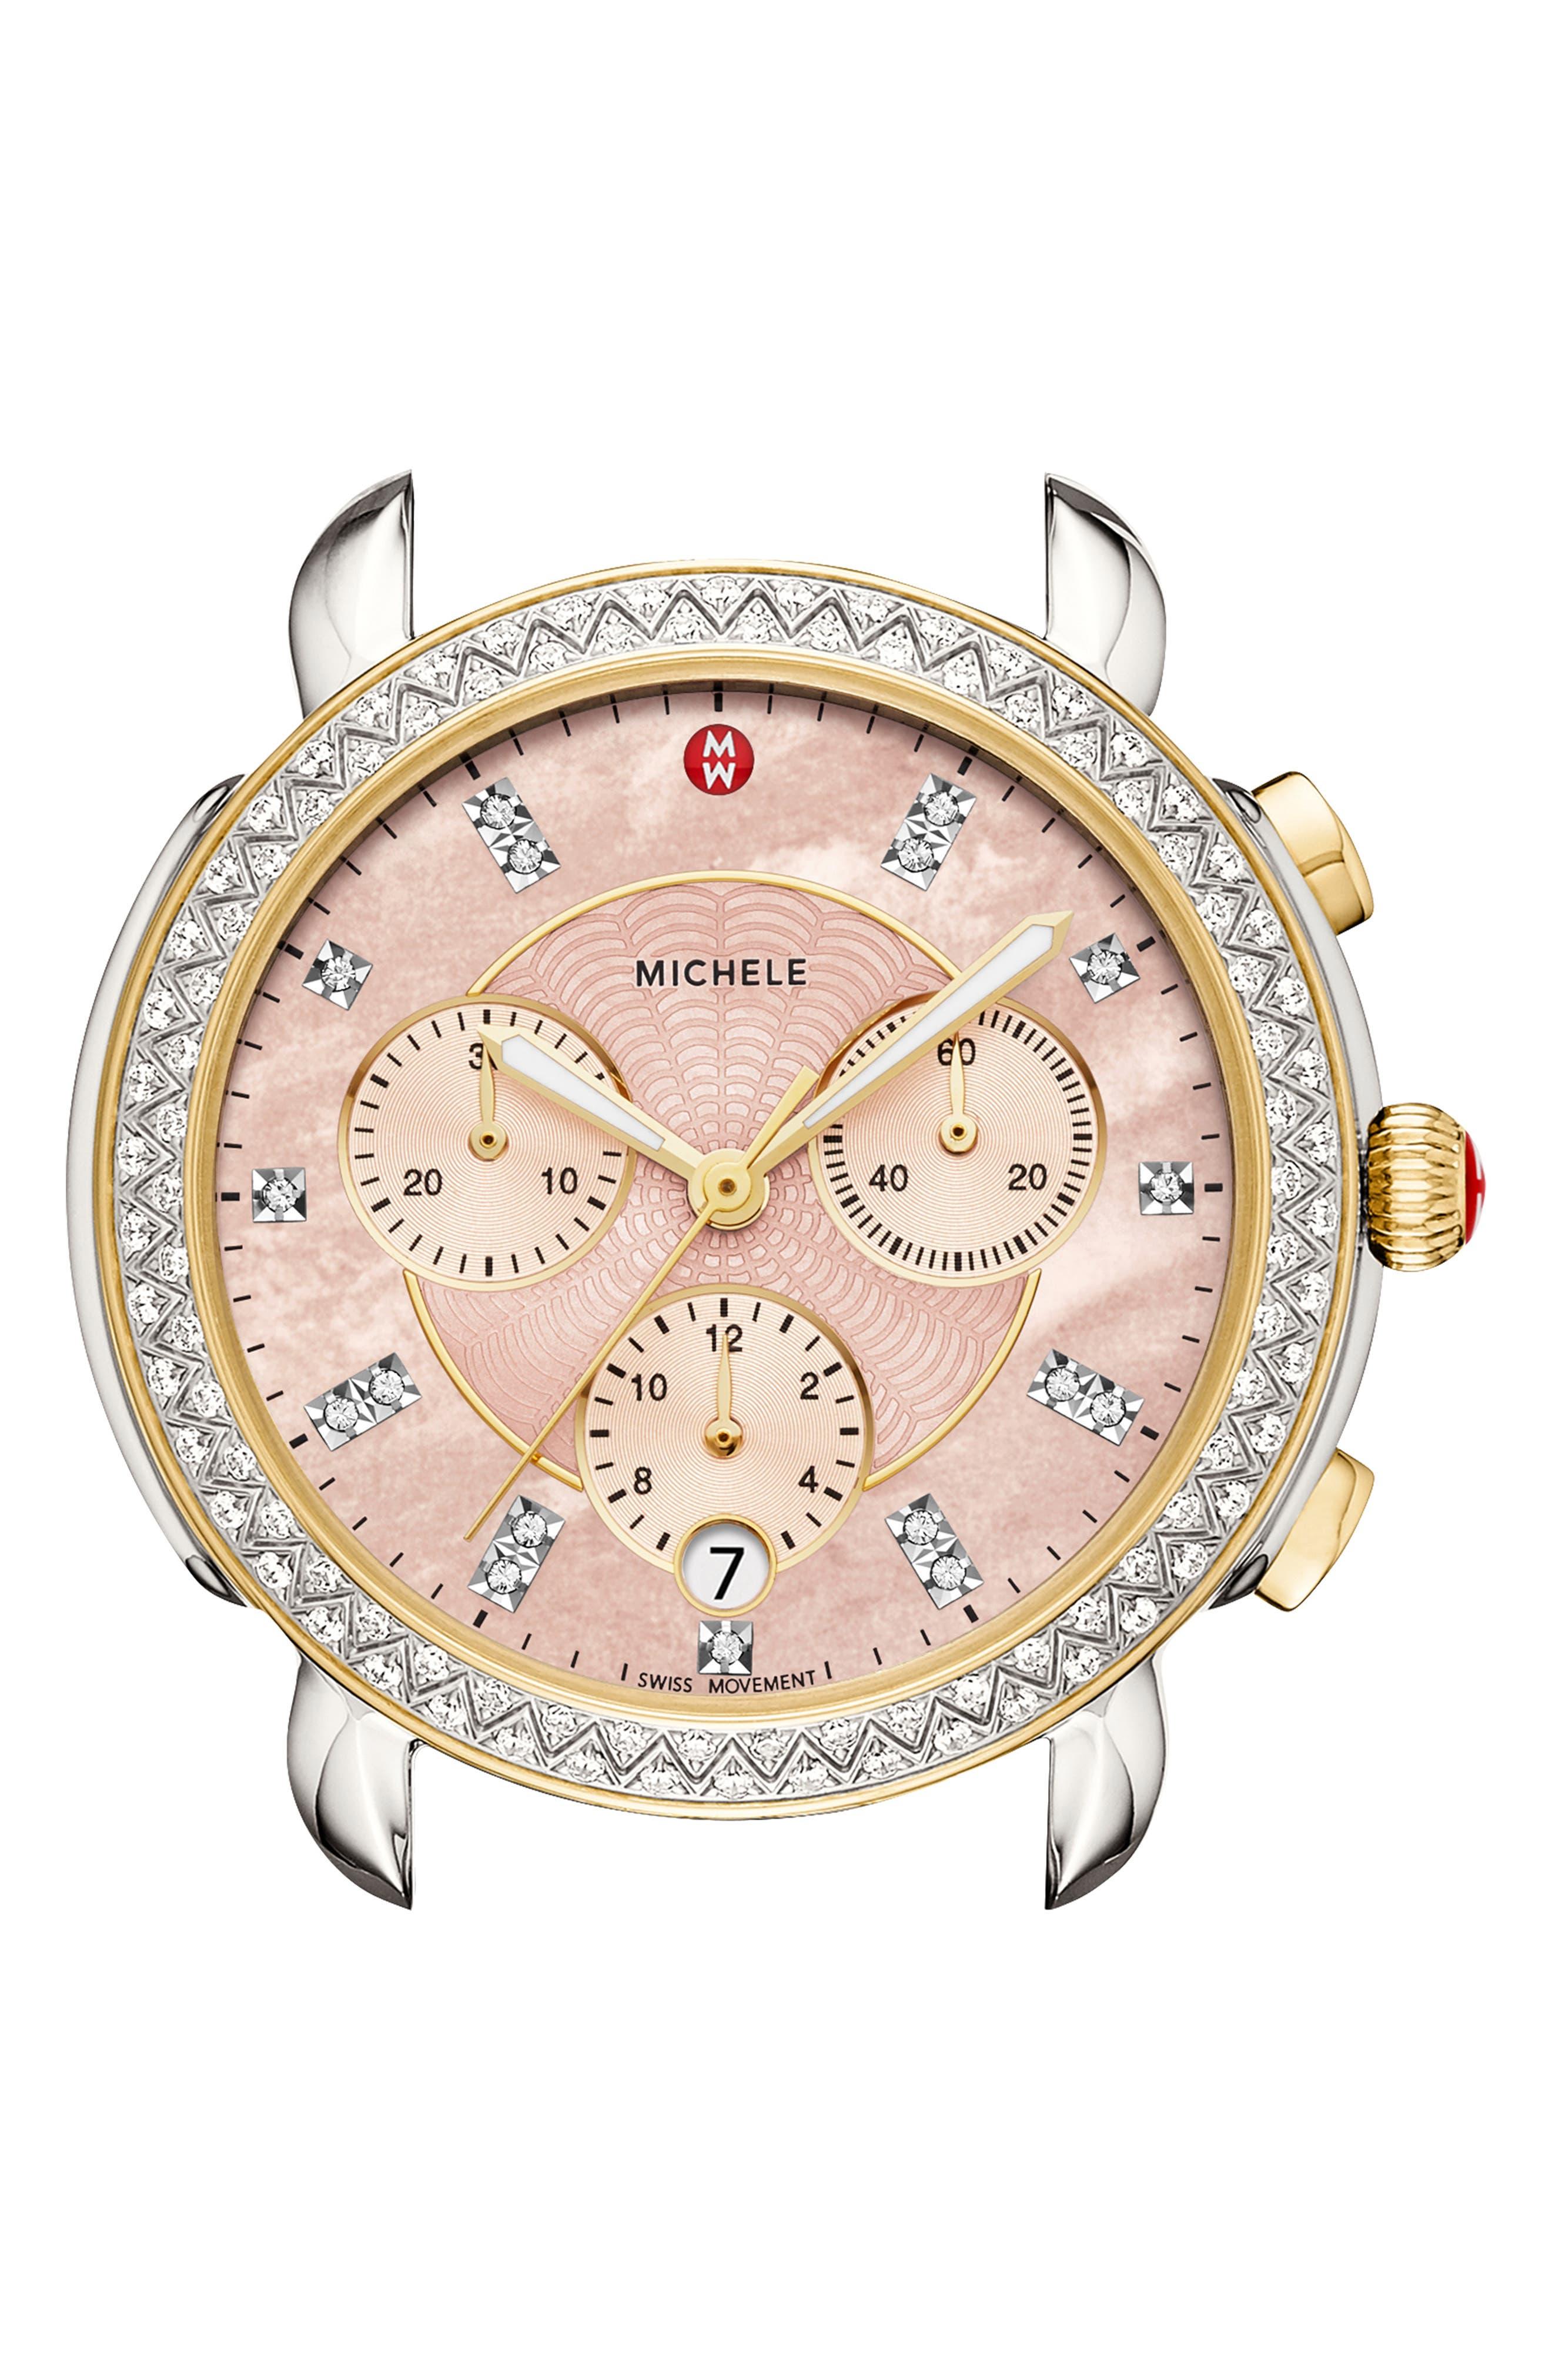 Sidney Chrono Diamond Diamond Dial Watch Case, 38mm,                             Main thumbnail 1, color,                             GOLD/ SILVER/ DESERT ROSE MOP